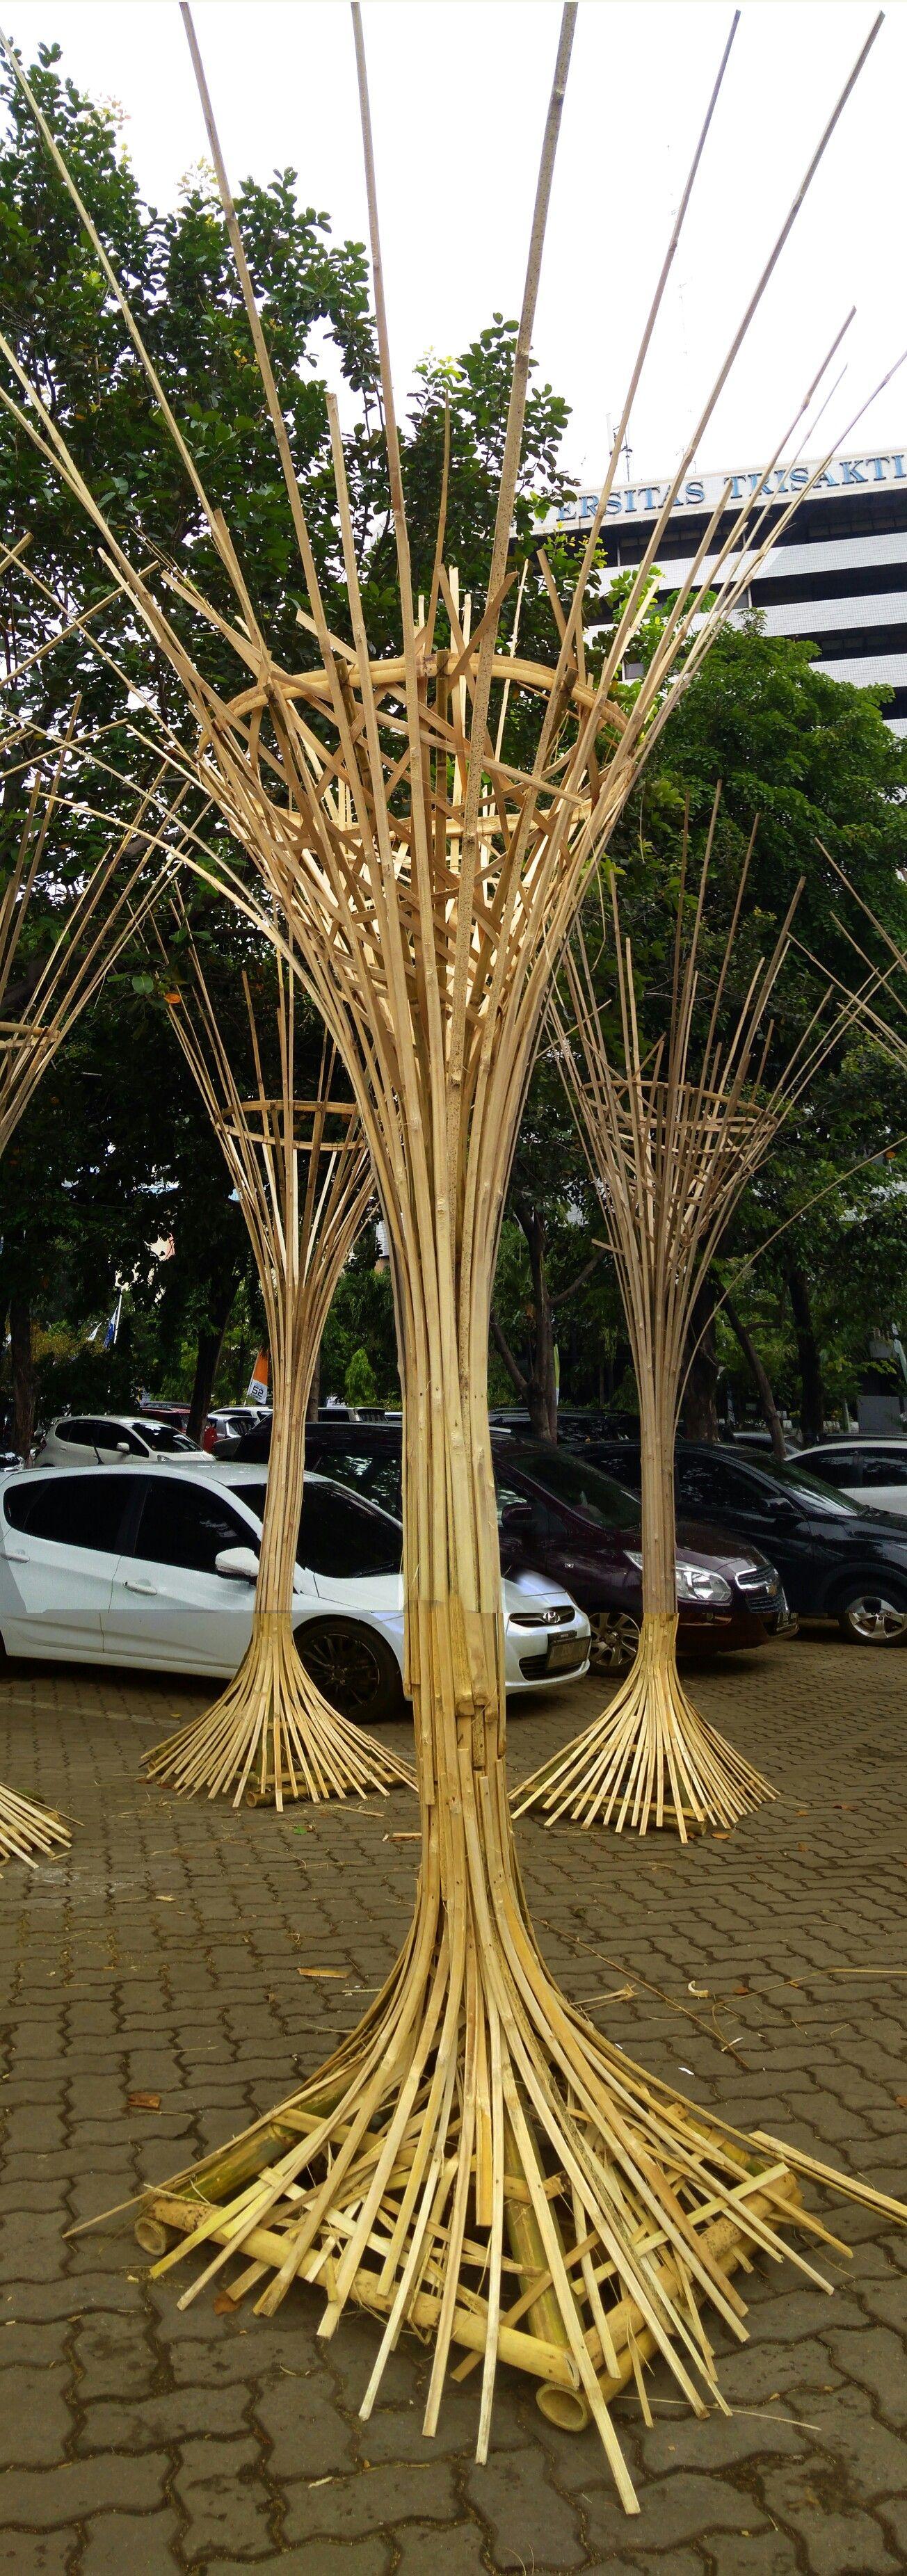 Outdoor Bamboo Lamp Post Bambu Bamboo Bamboo Architecture